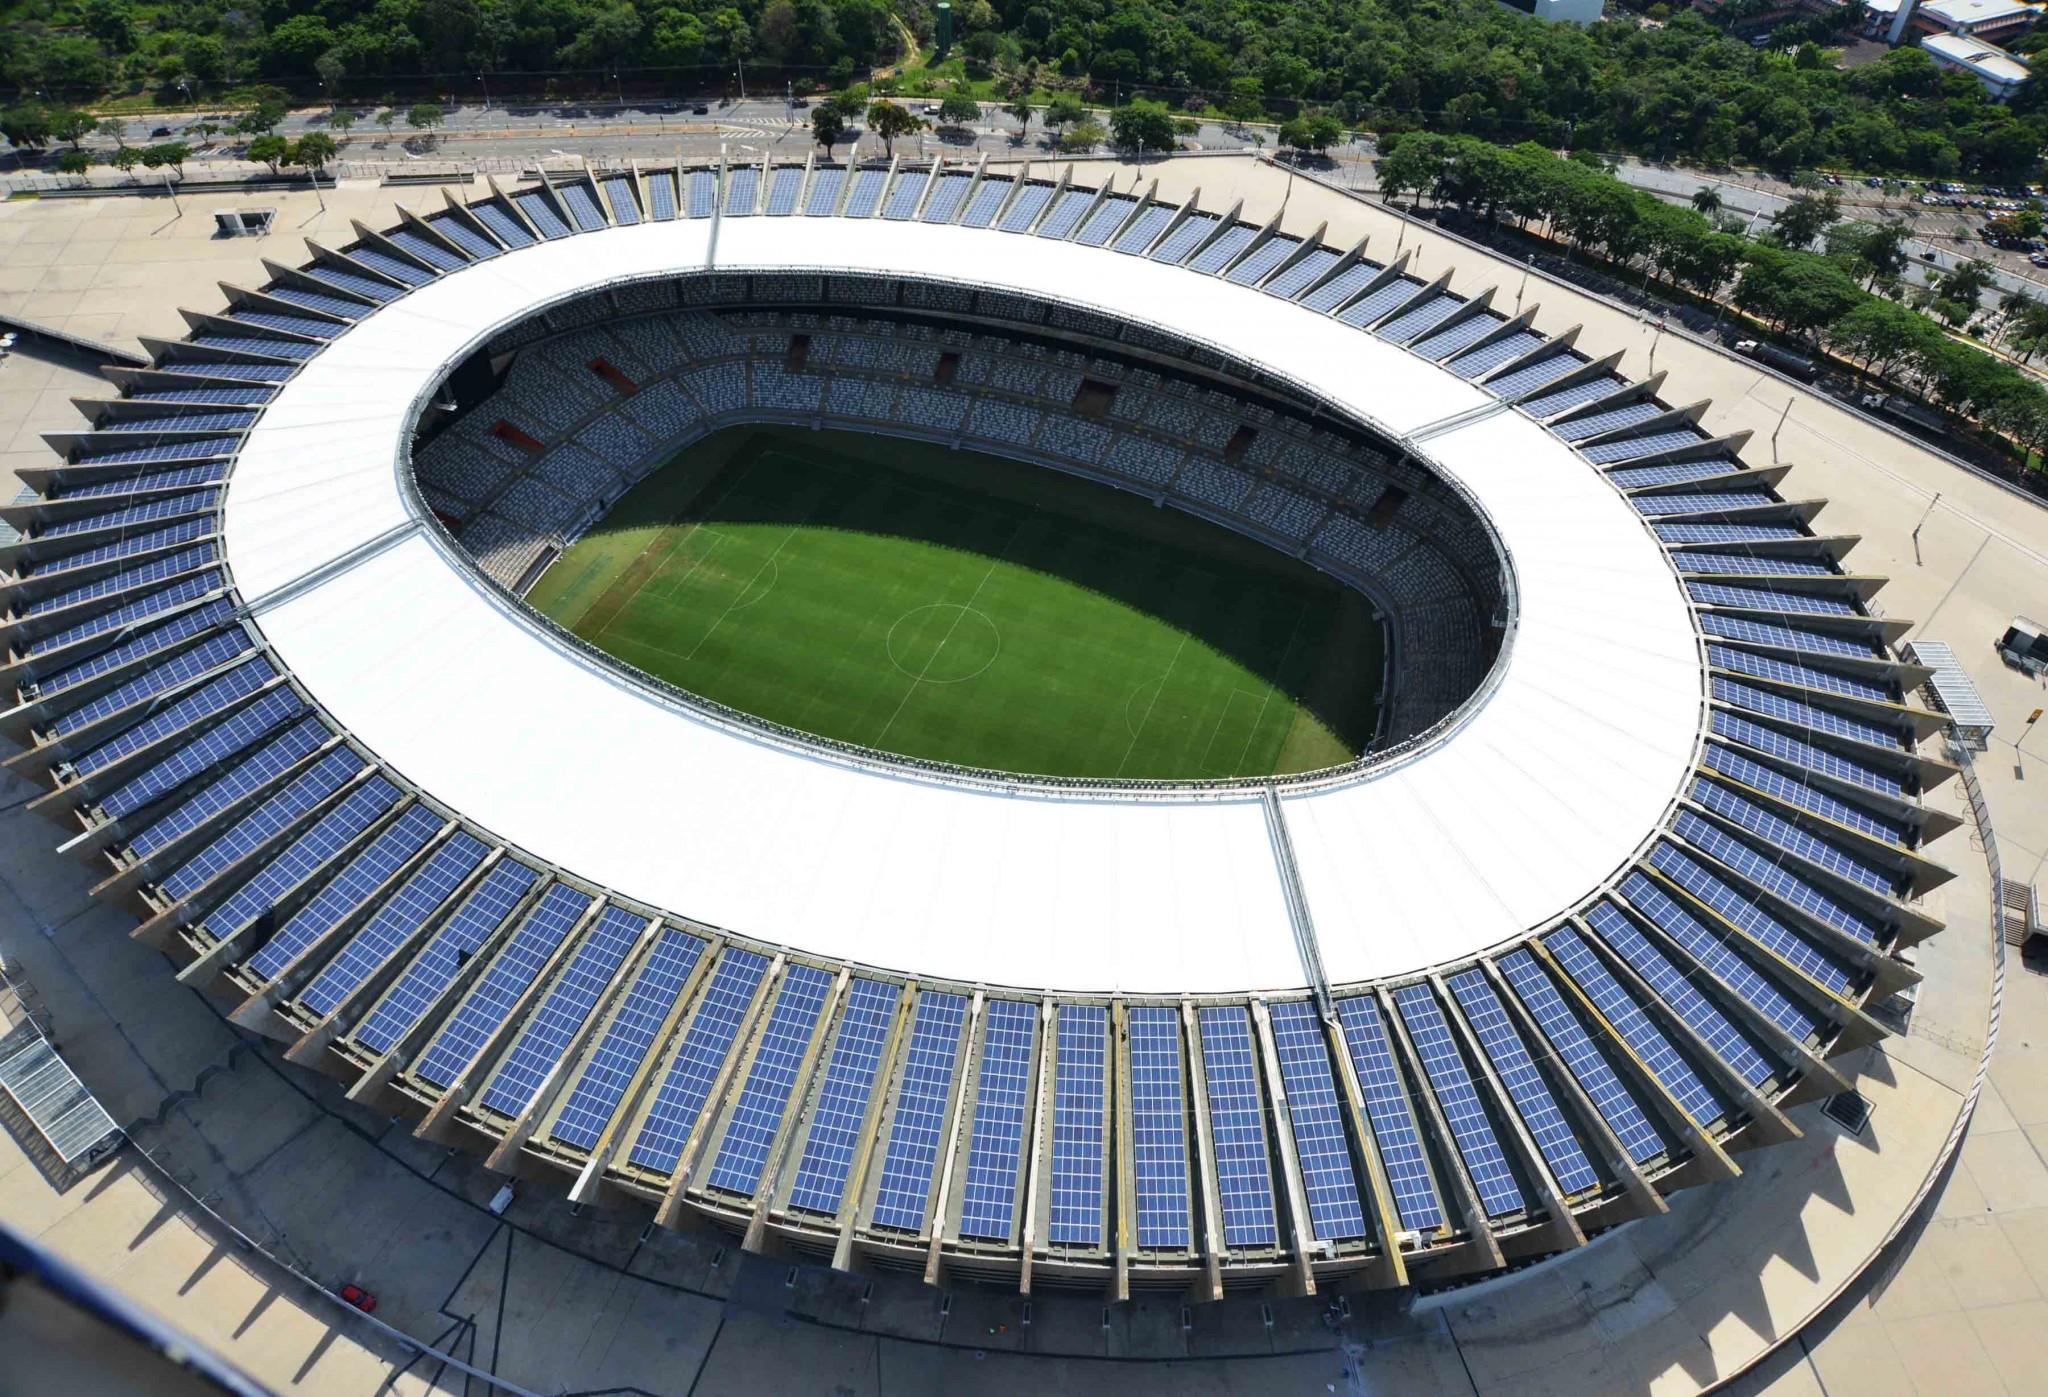 energia-solar-no-brasil-estadio-mineirao-com-solar